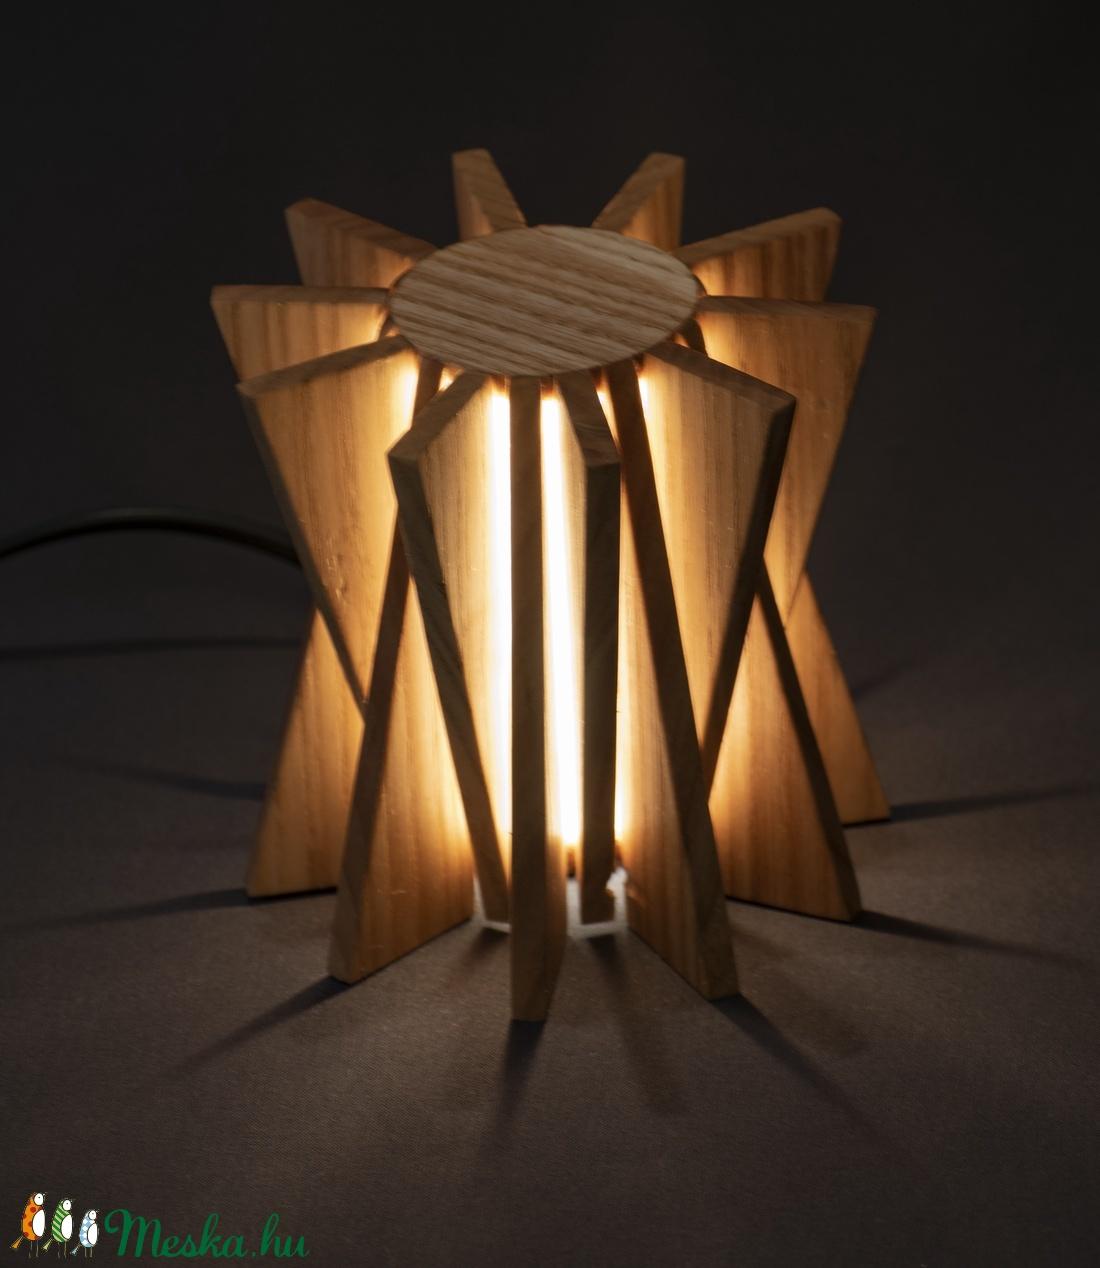 Star (Deerwooddesign) - Meska.hu